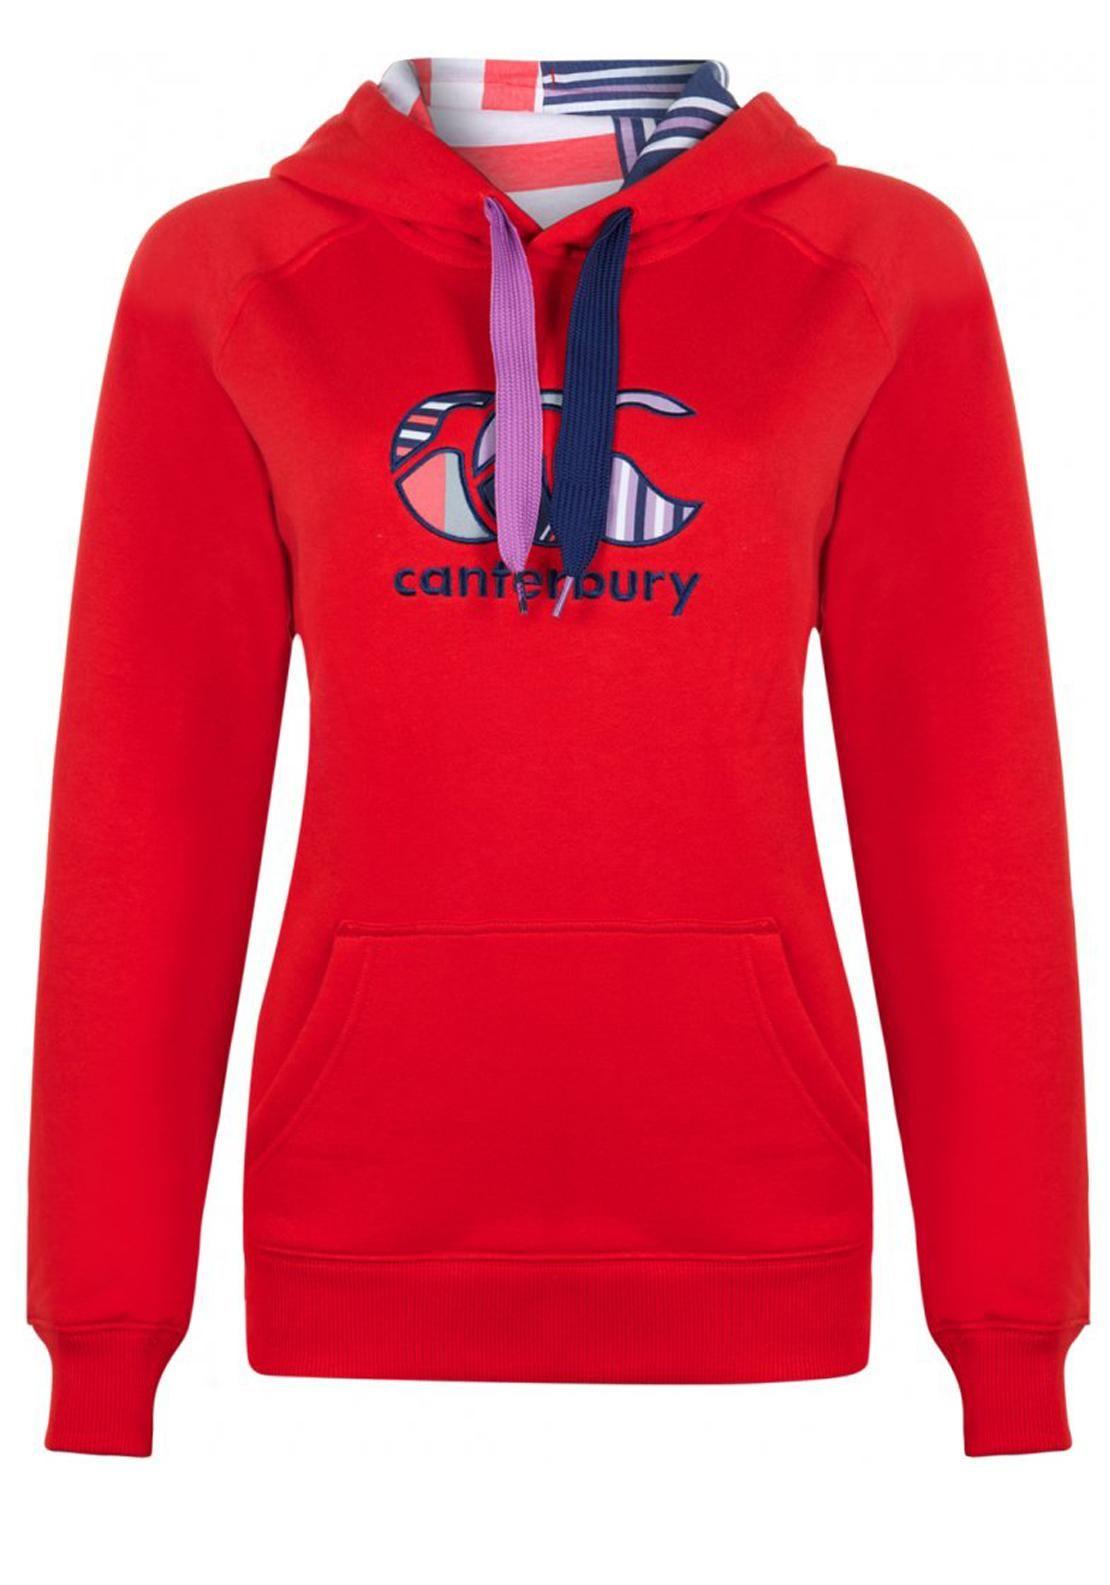 Canterbury Womens Uglies Hoody, Poppy | McElhinneys Online Department Store